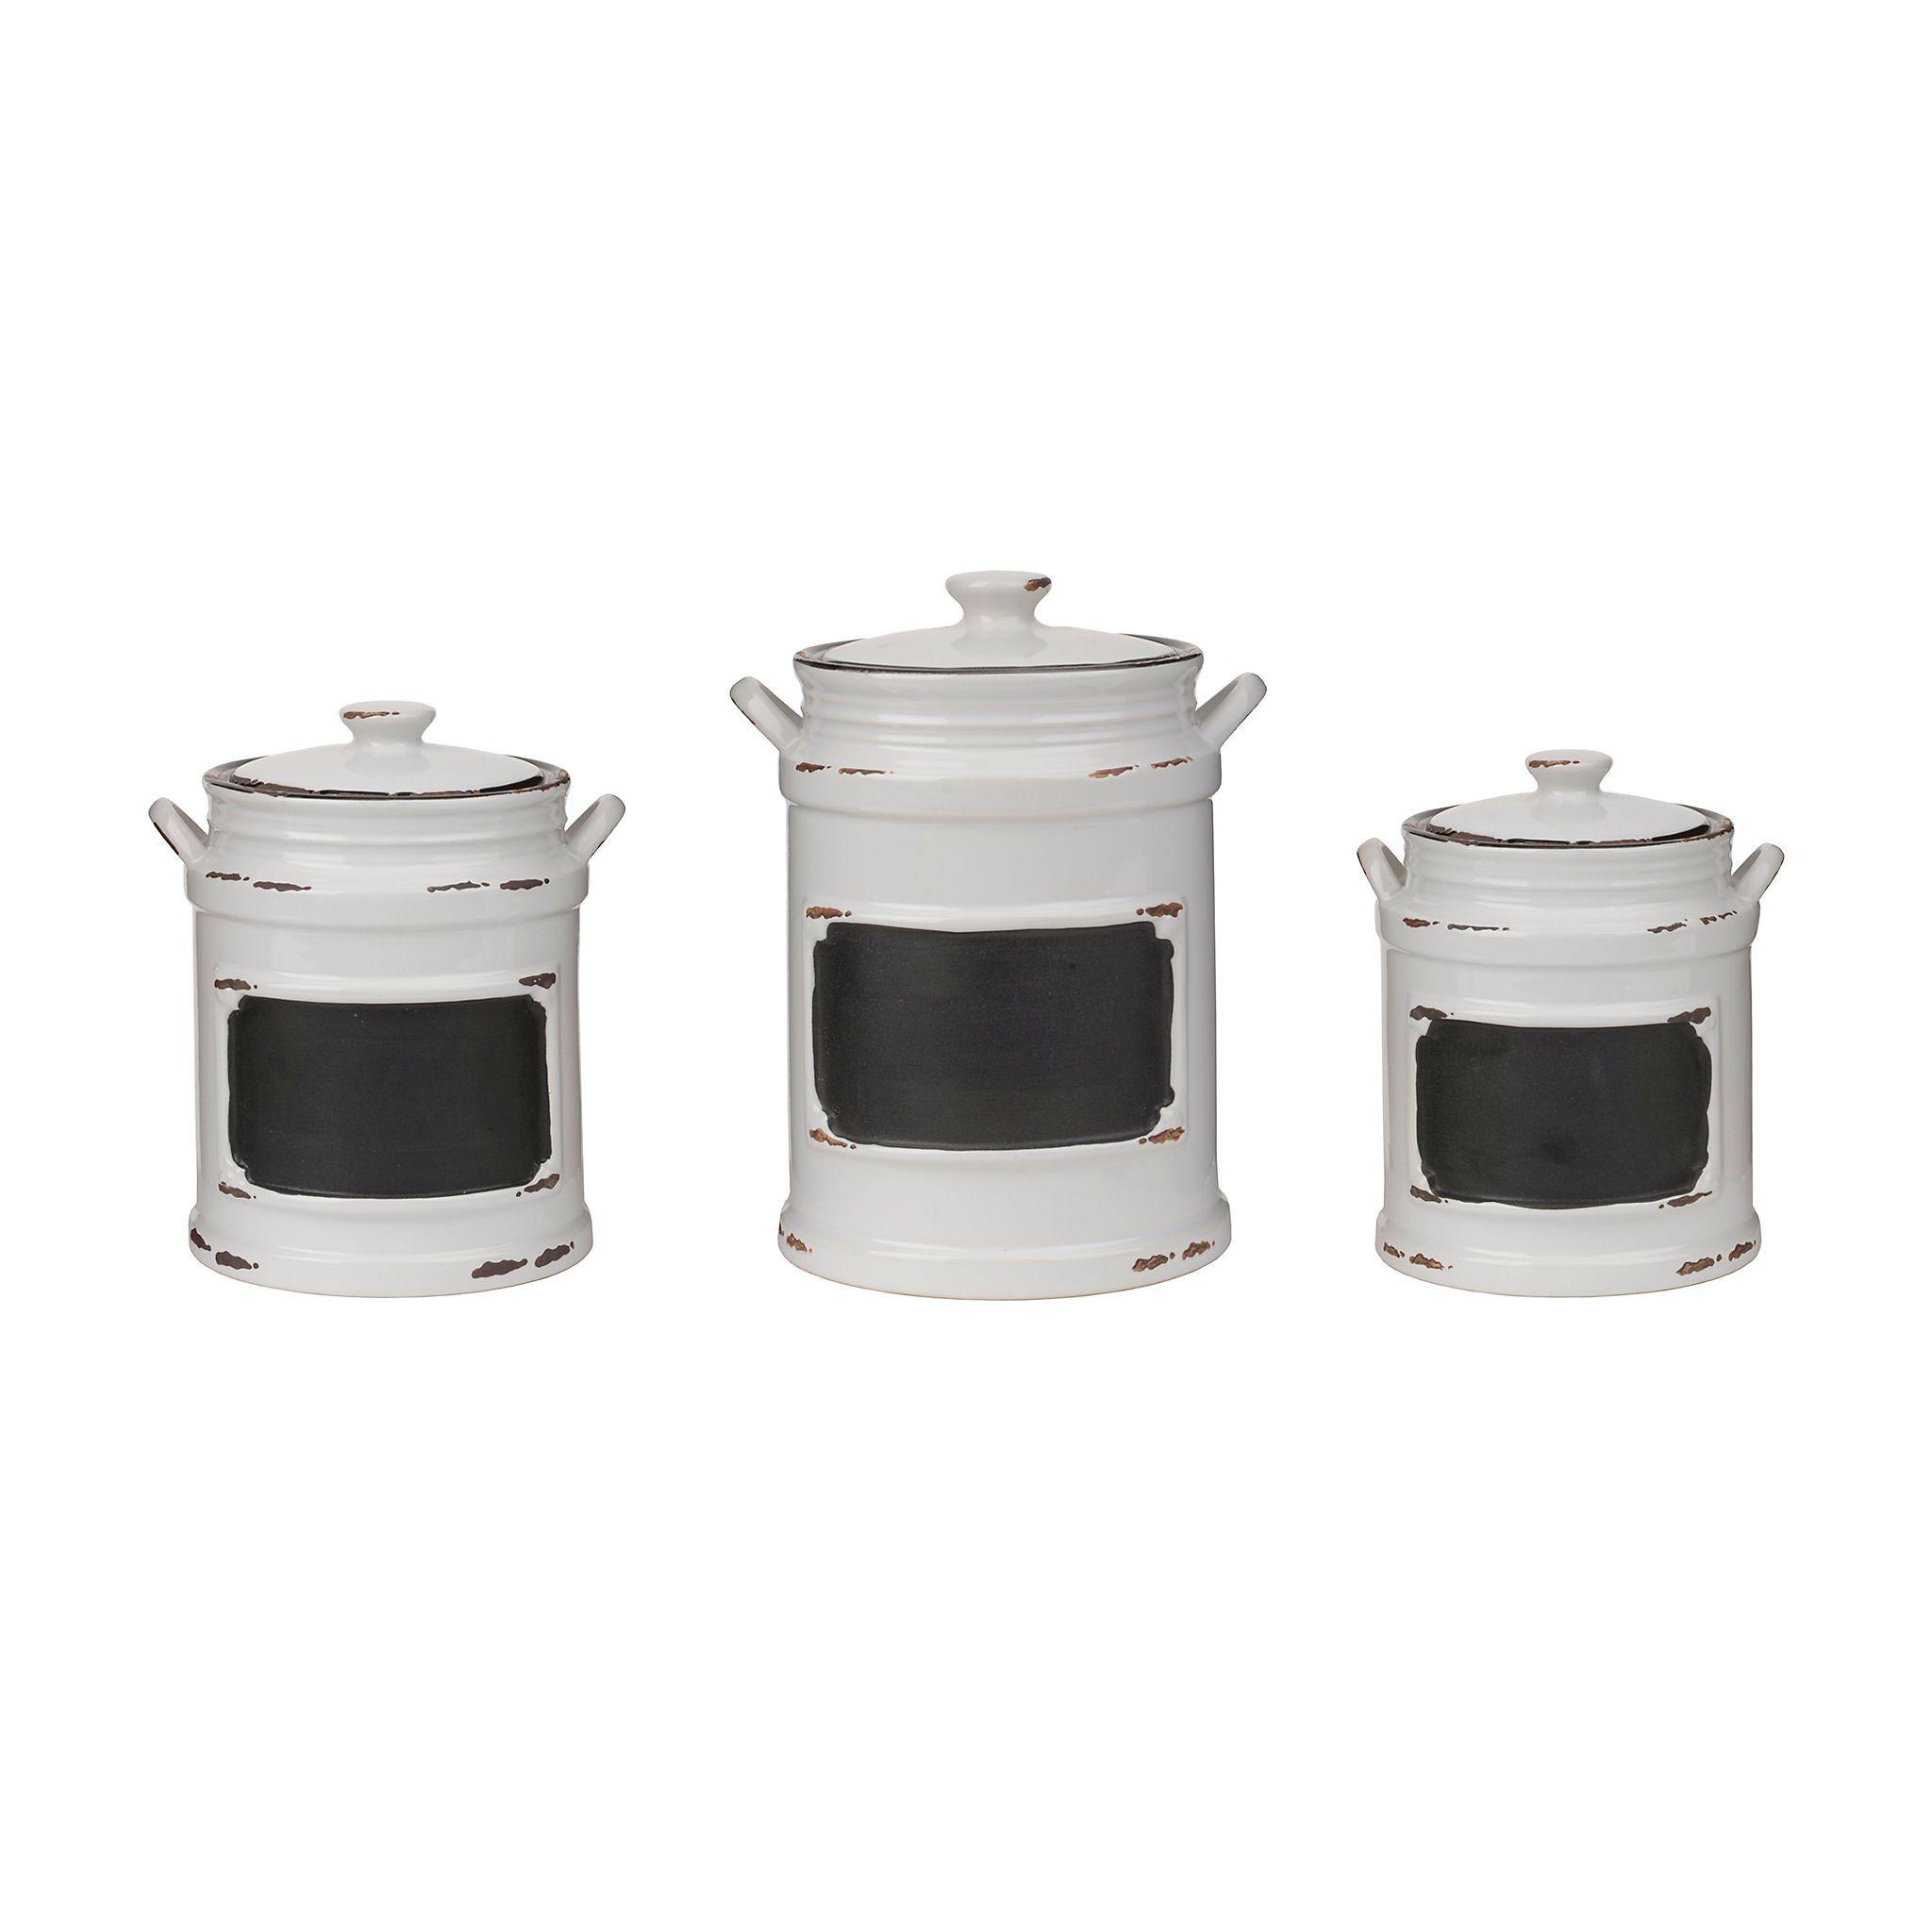 kitchen storage canisters modular outdoor frames vintage white chalkboard set of 3 canister sets